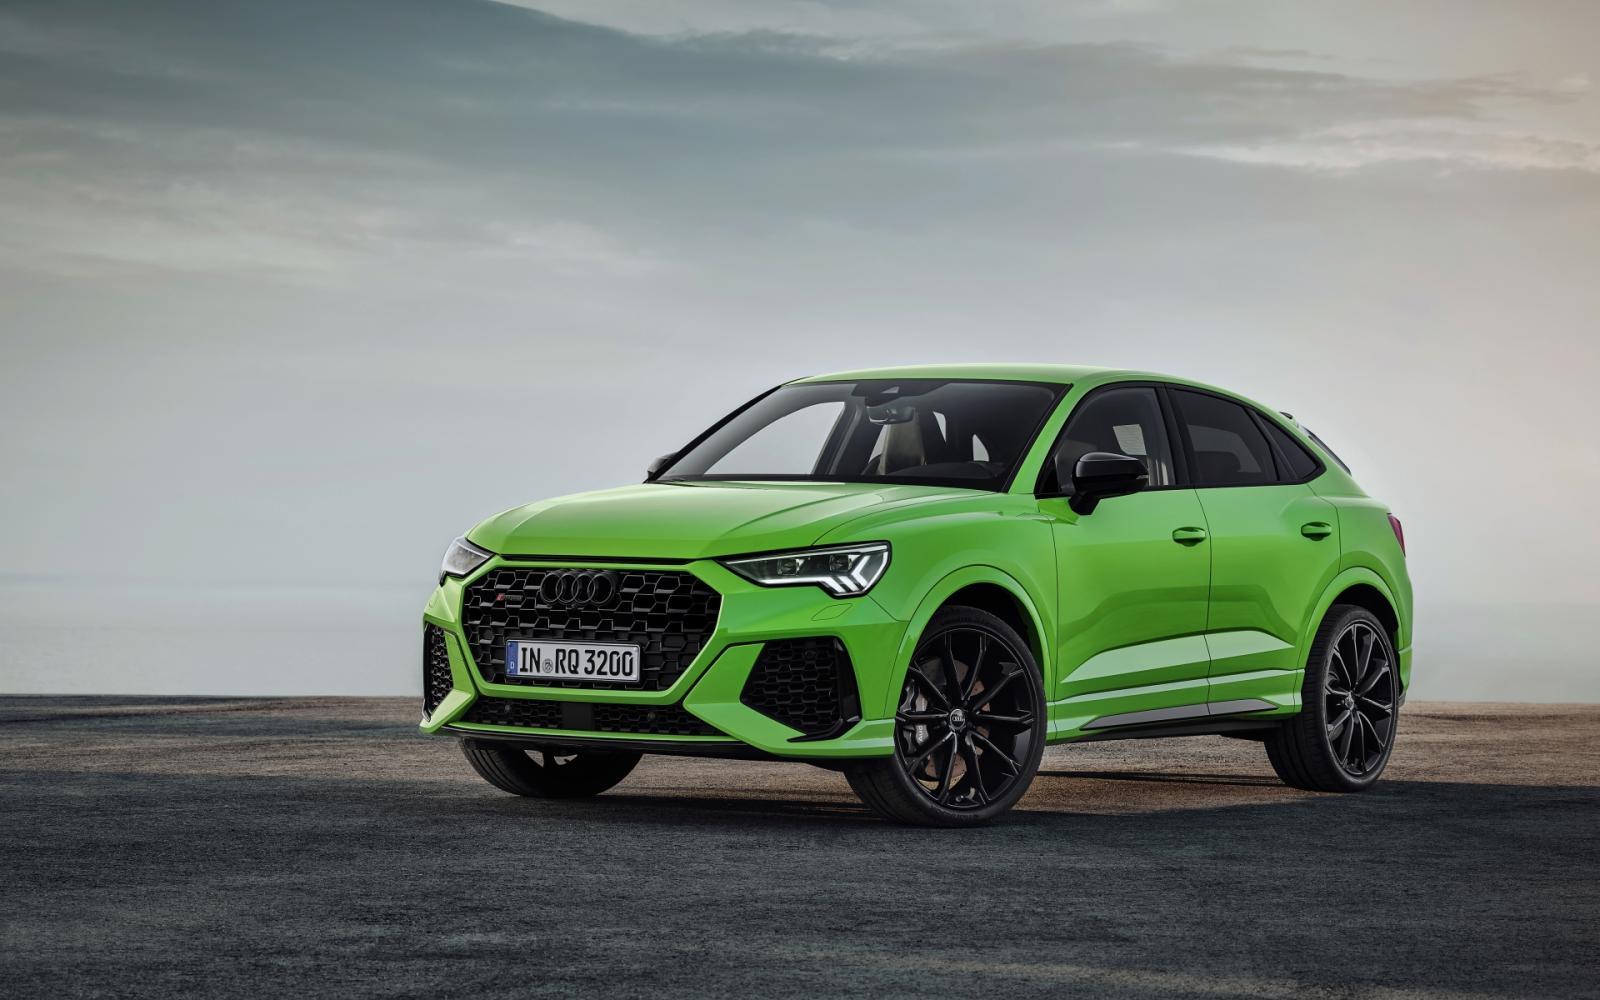 Audi RS Q3 en RS Q3 Sportback: Mooi groen is niet lelijk